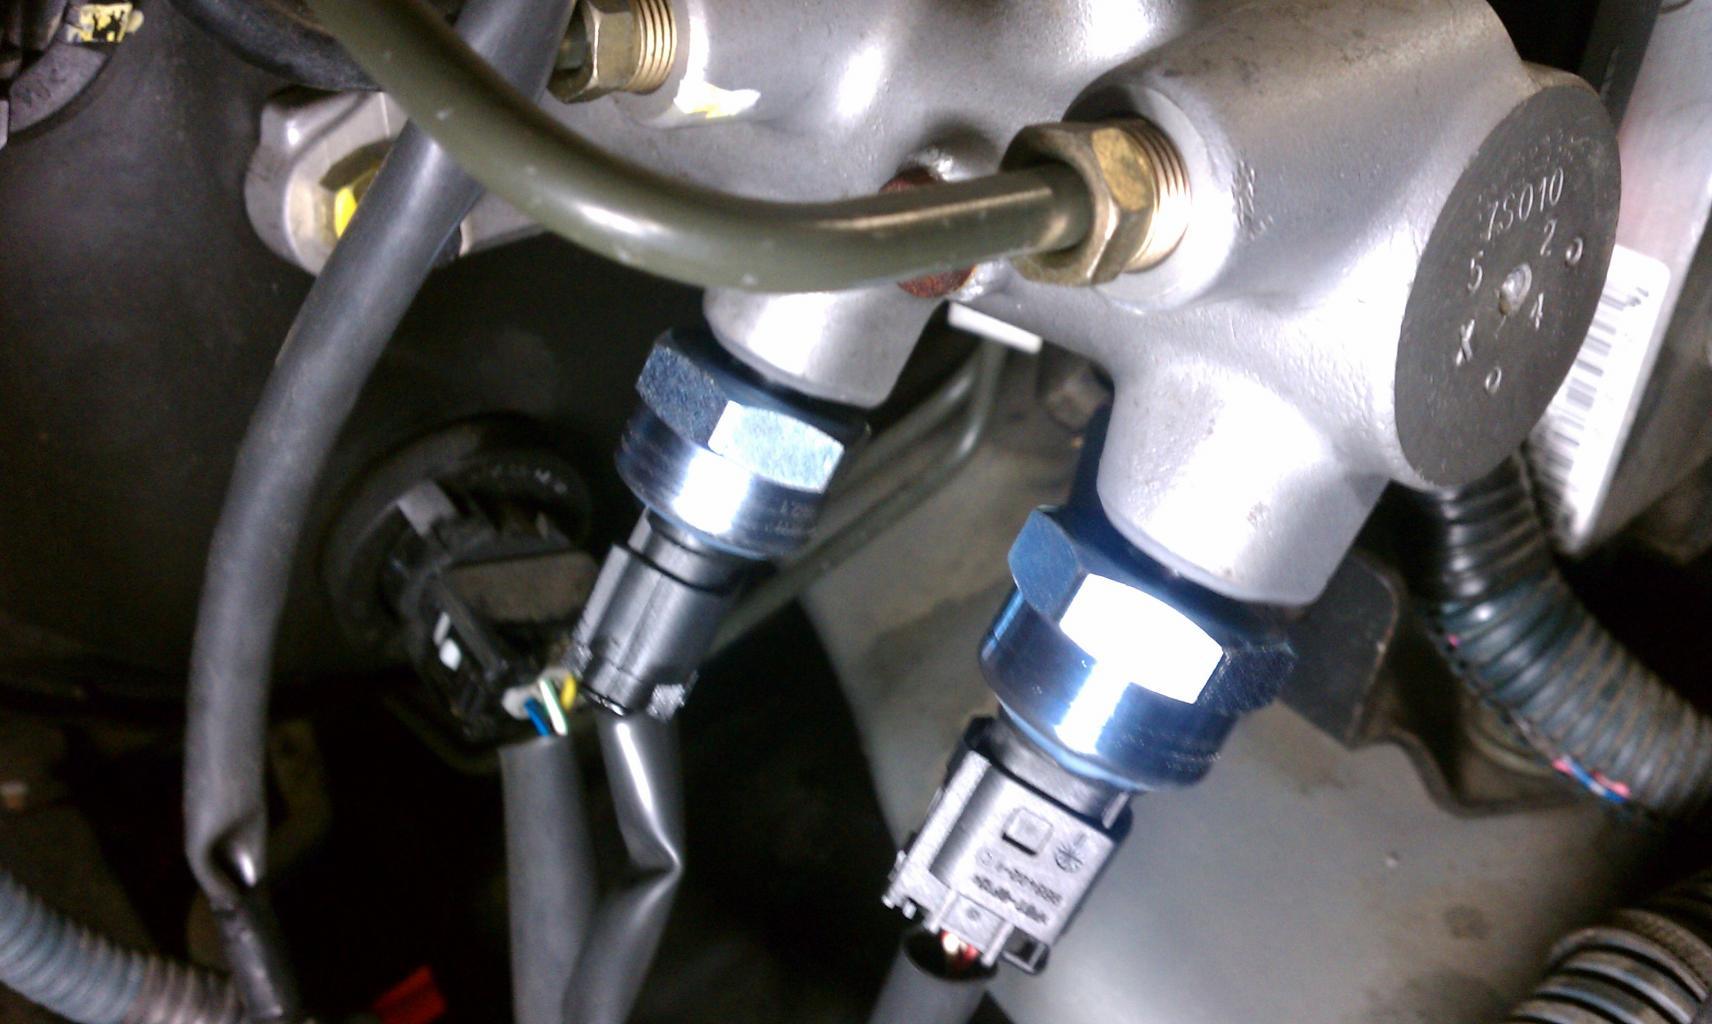 C1142 diagnosis (SLIP, VDC, & BRAKE lights on) | Nissan Armada